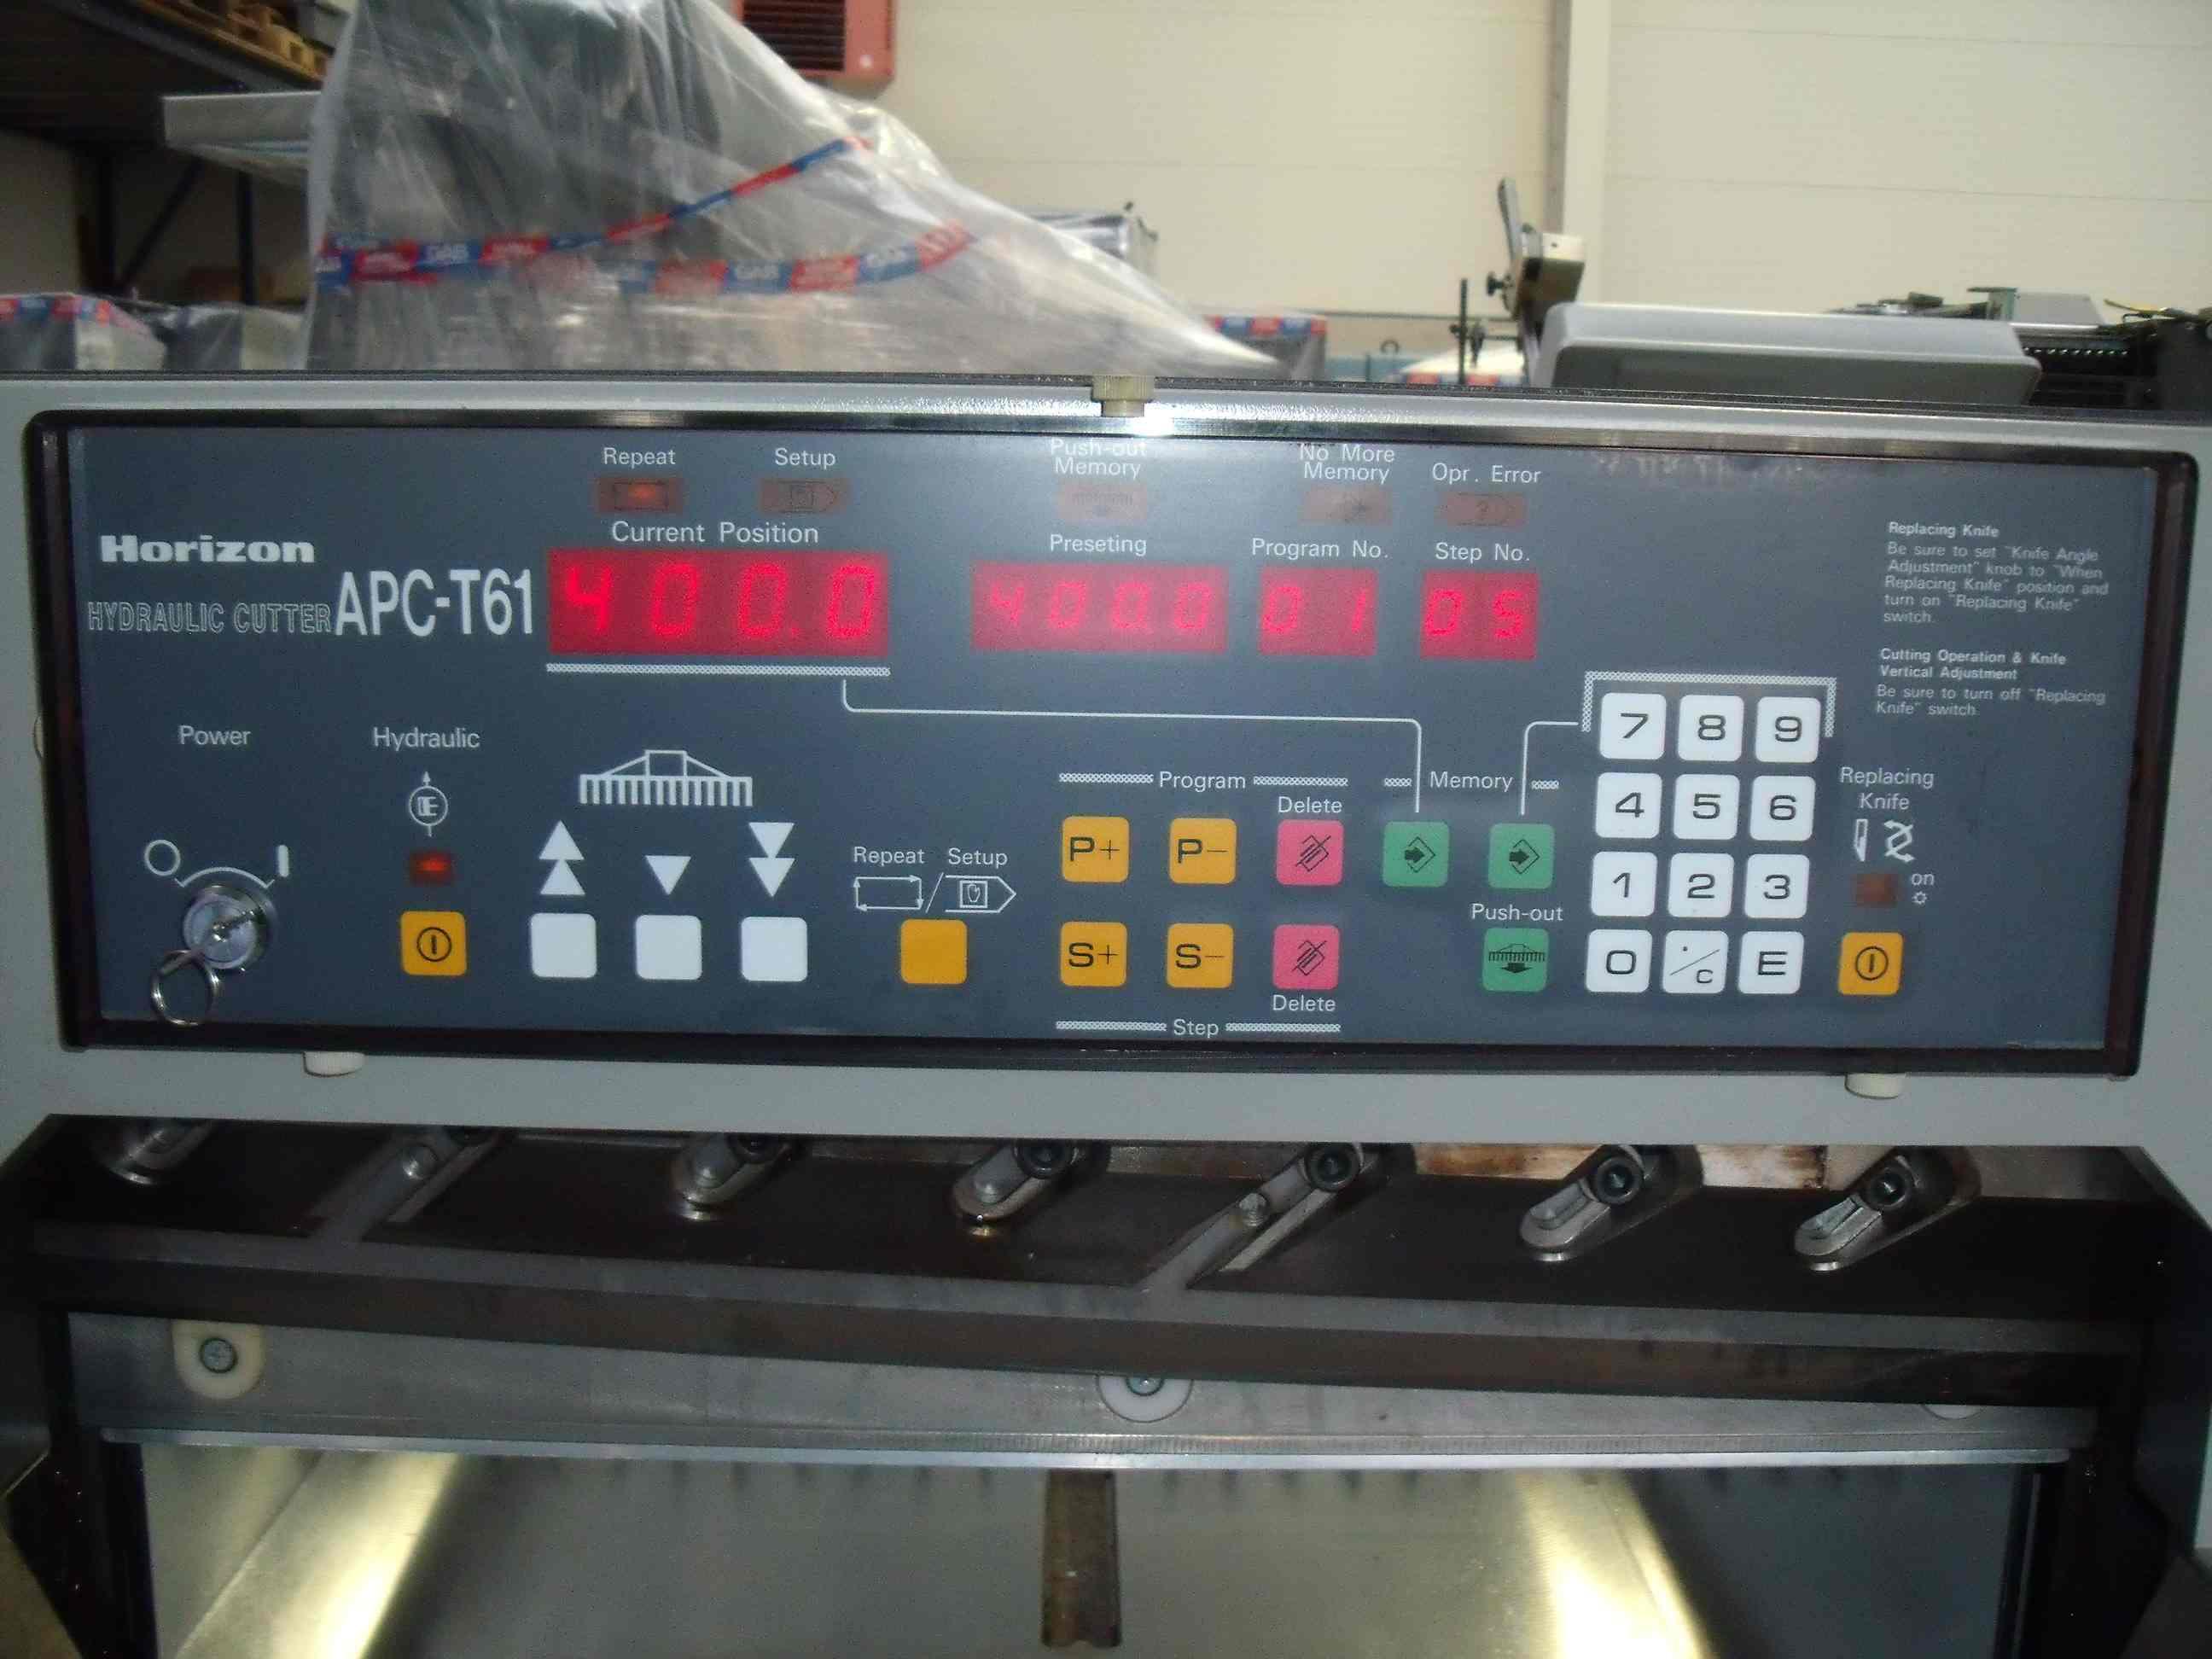 HORIZON APC T61 GUILLOTINE